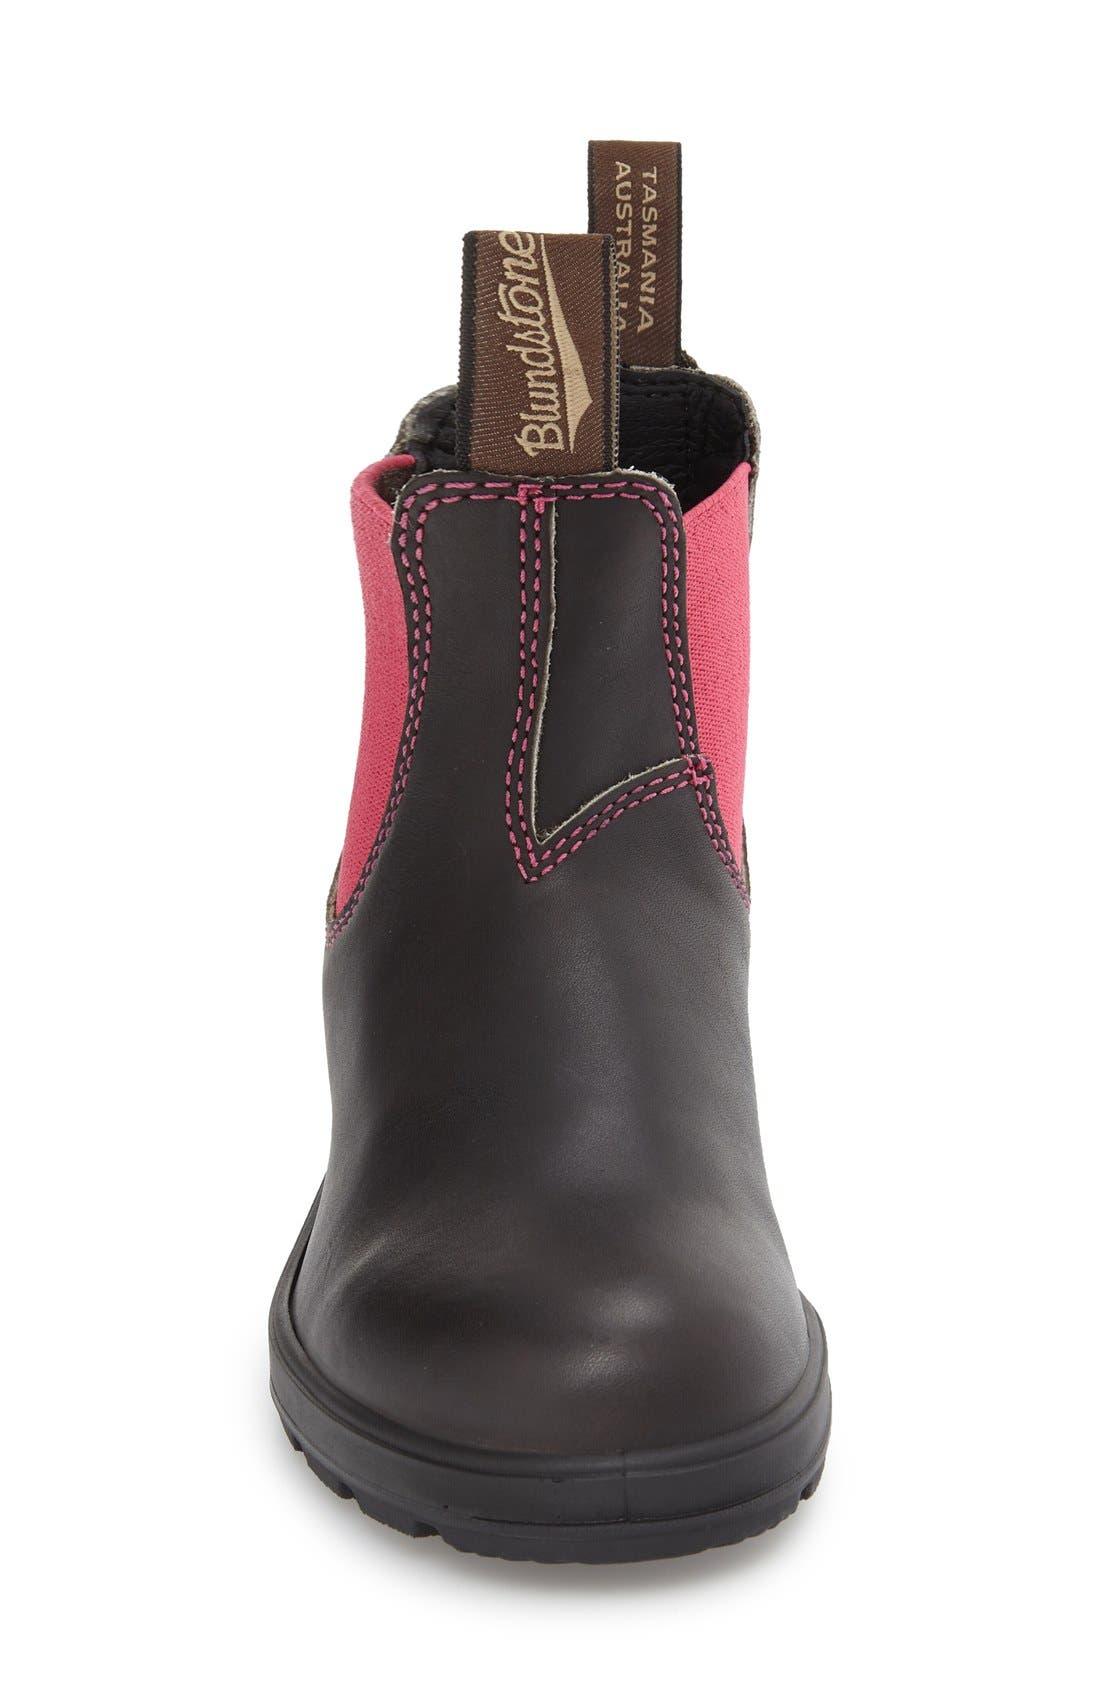 Footwear 'Original - 500 Series' Water Resistant Chelsea Boot,                             Alternate thumbnail 3, color,                             200